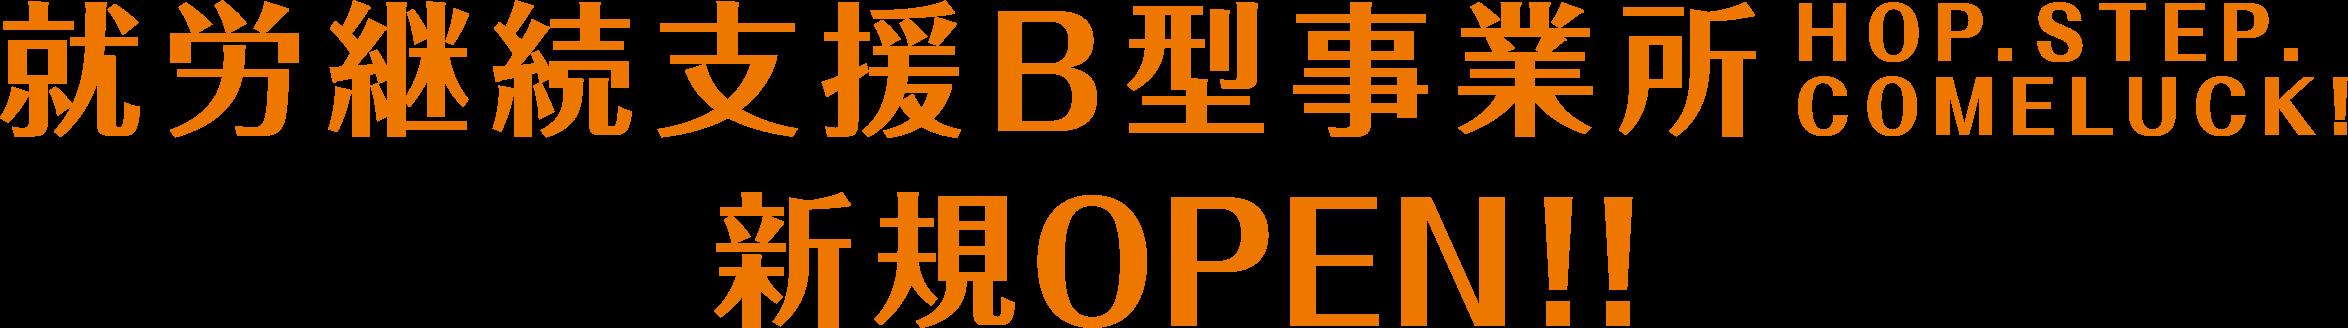 就職継続支援B型事業所HOP.STEP.COMELUCK!新規オープン